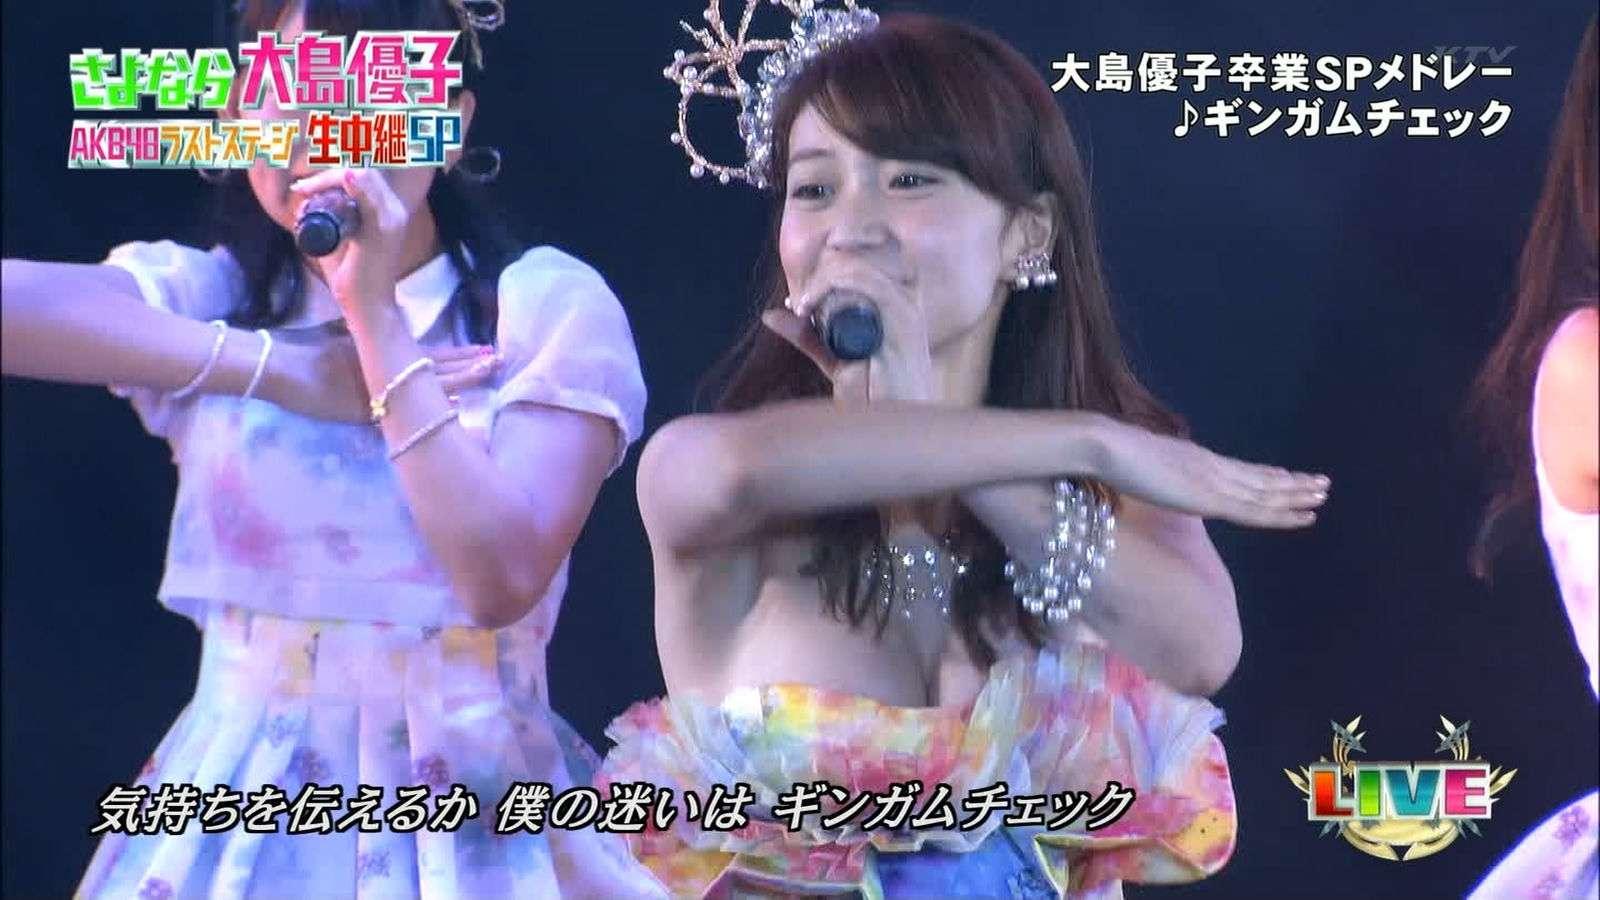 AKB48大島優子乳首ポロリエロ画像エロ動画まとめ